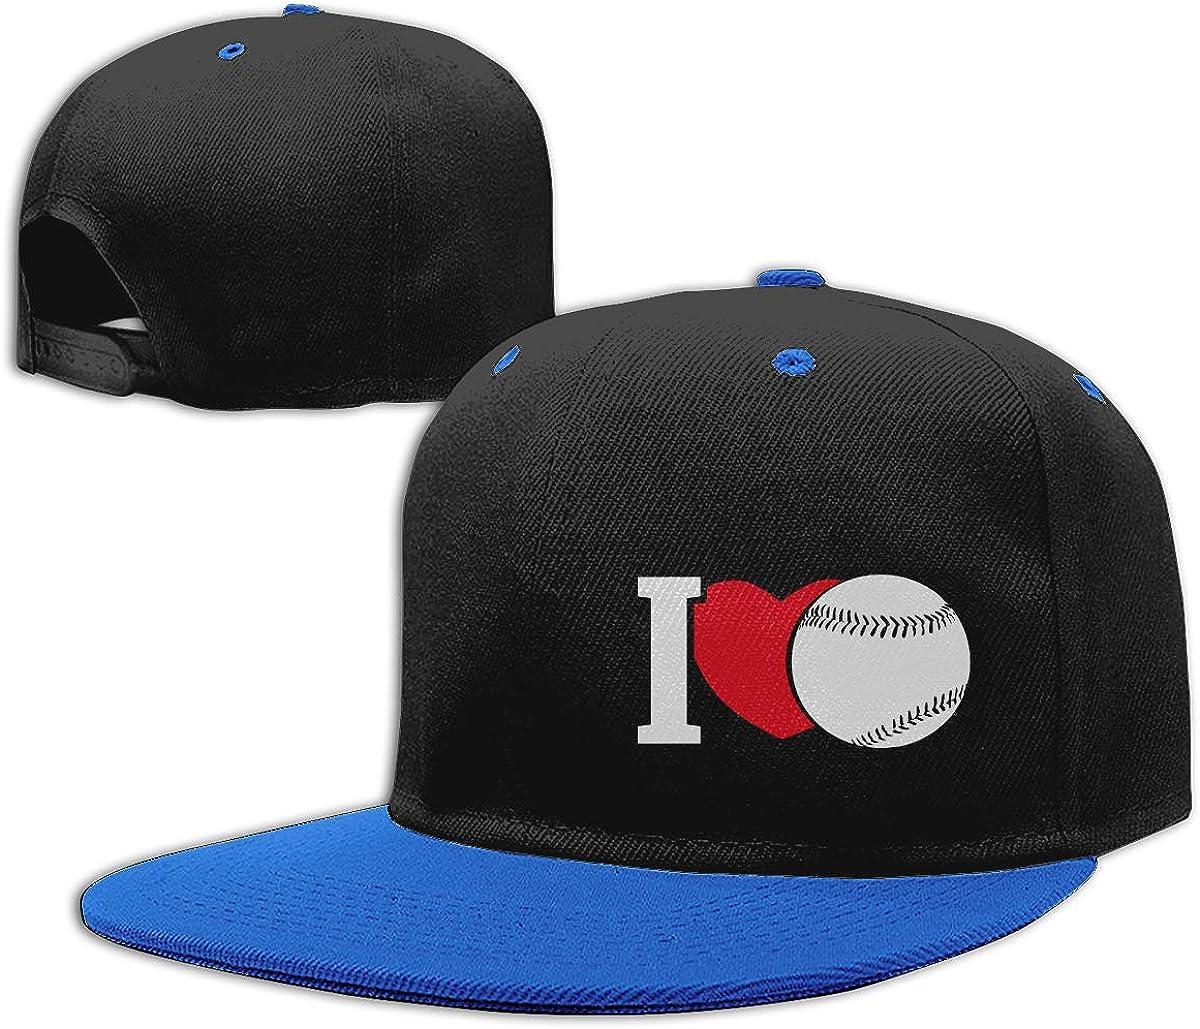 Baseball Clipart Baseball Heart Fashion Flat Bill Baseball Caps NMG-01 Men and Women Snapback Cap